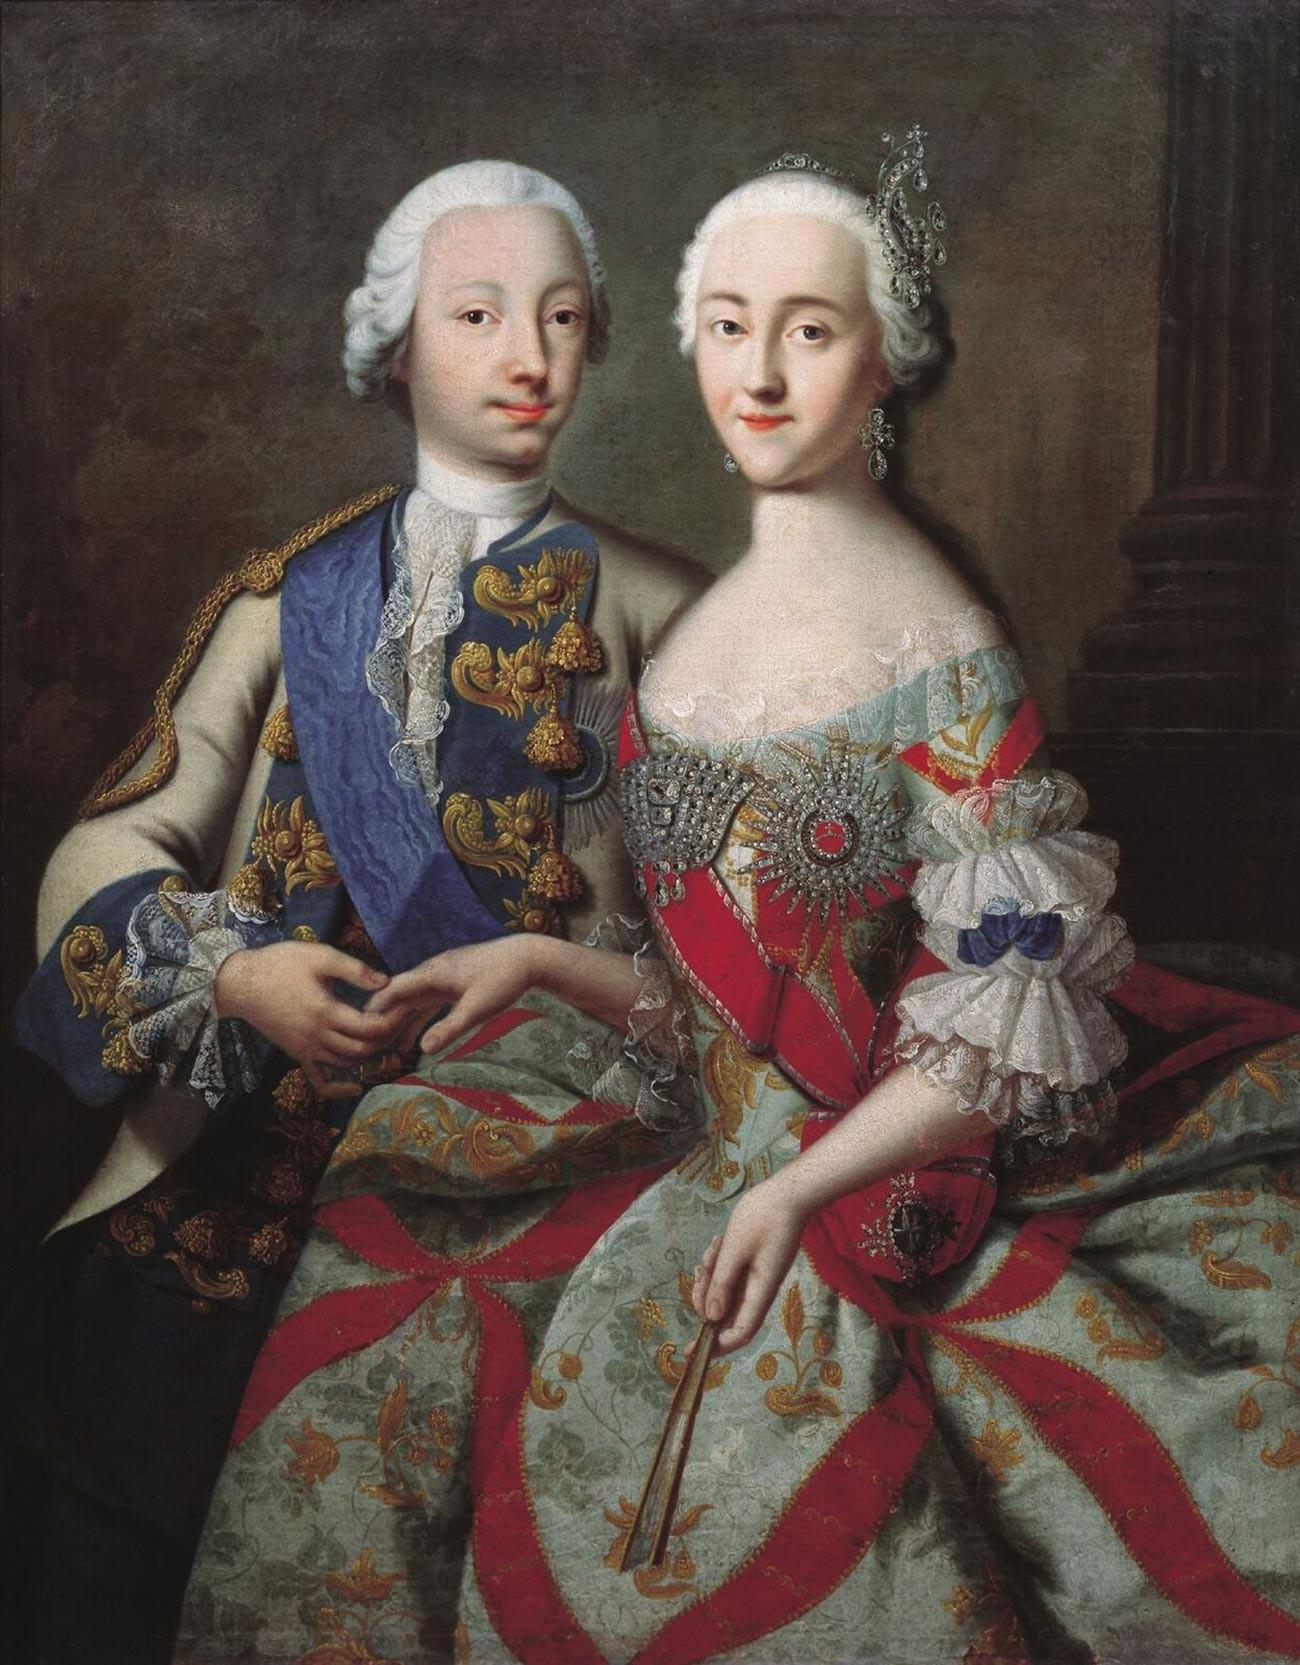 Peter und Katharina